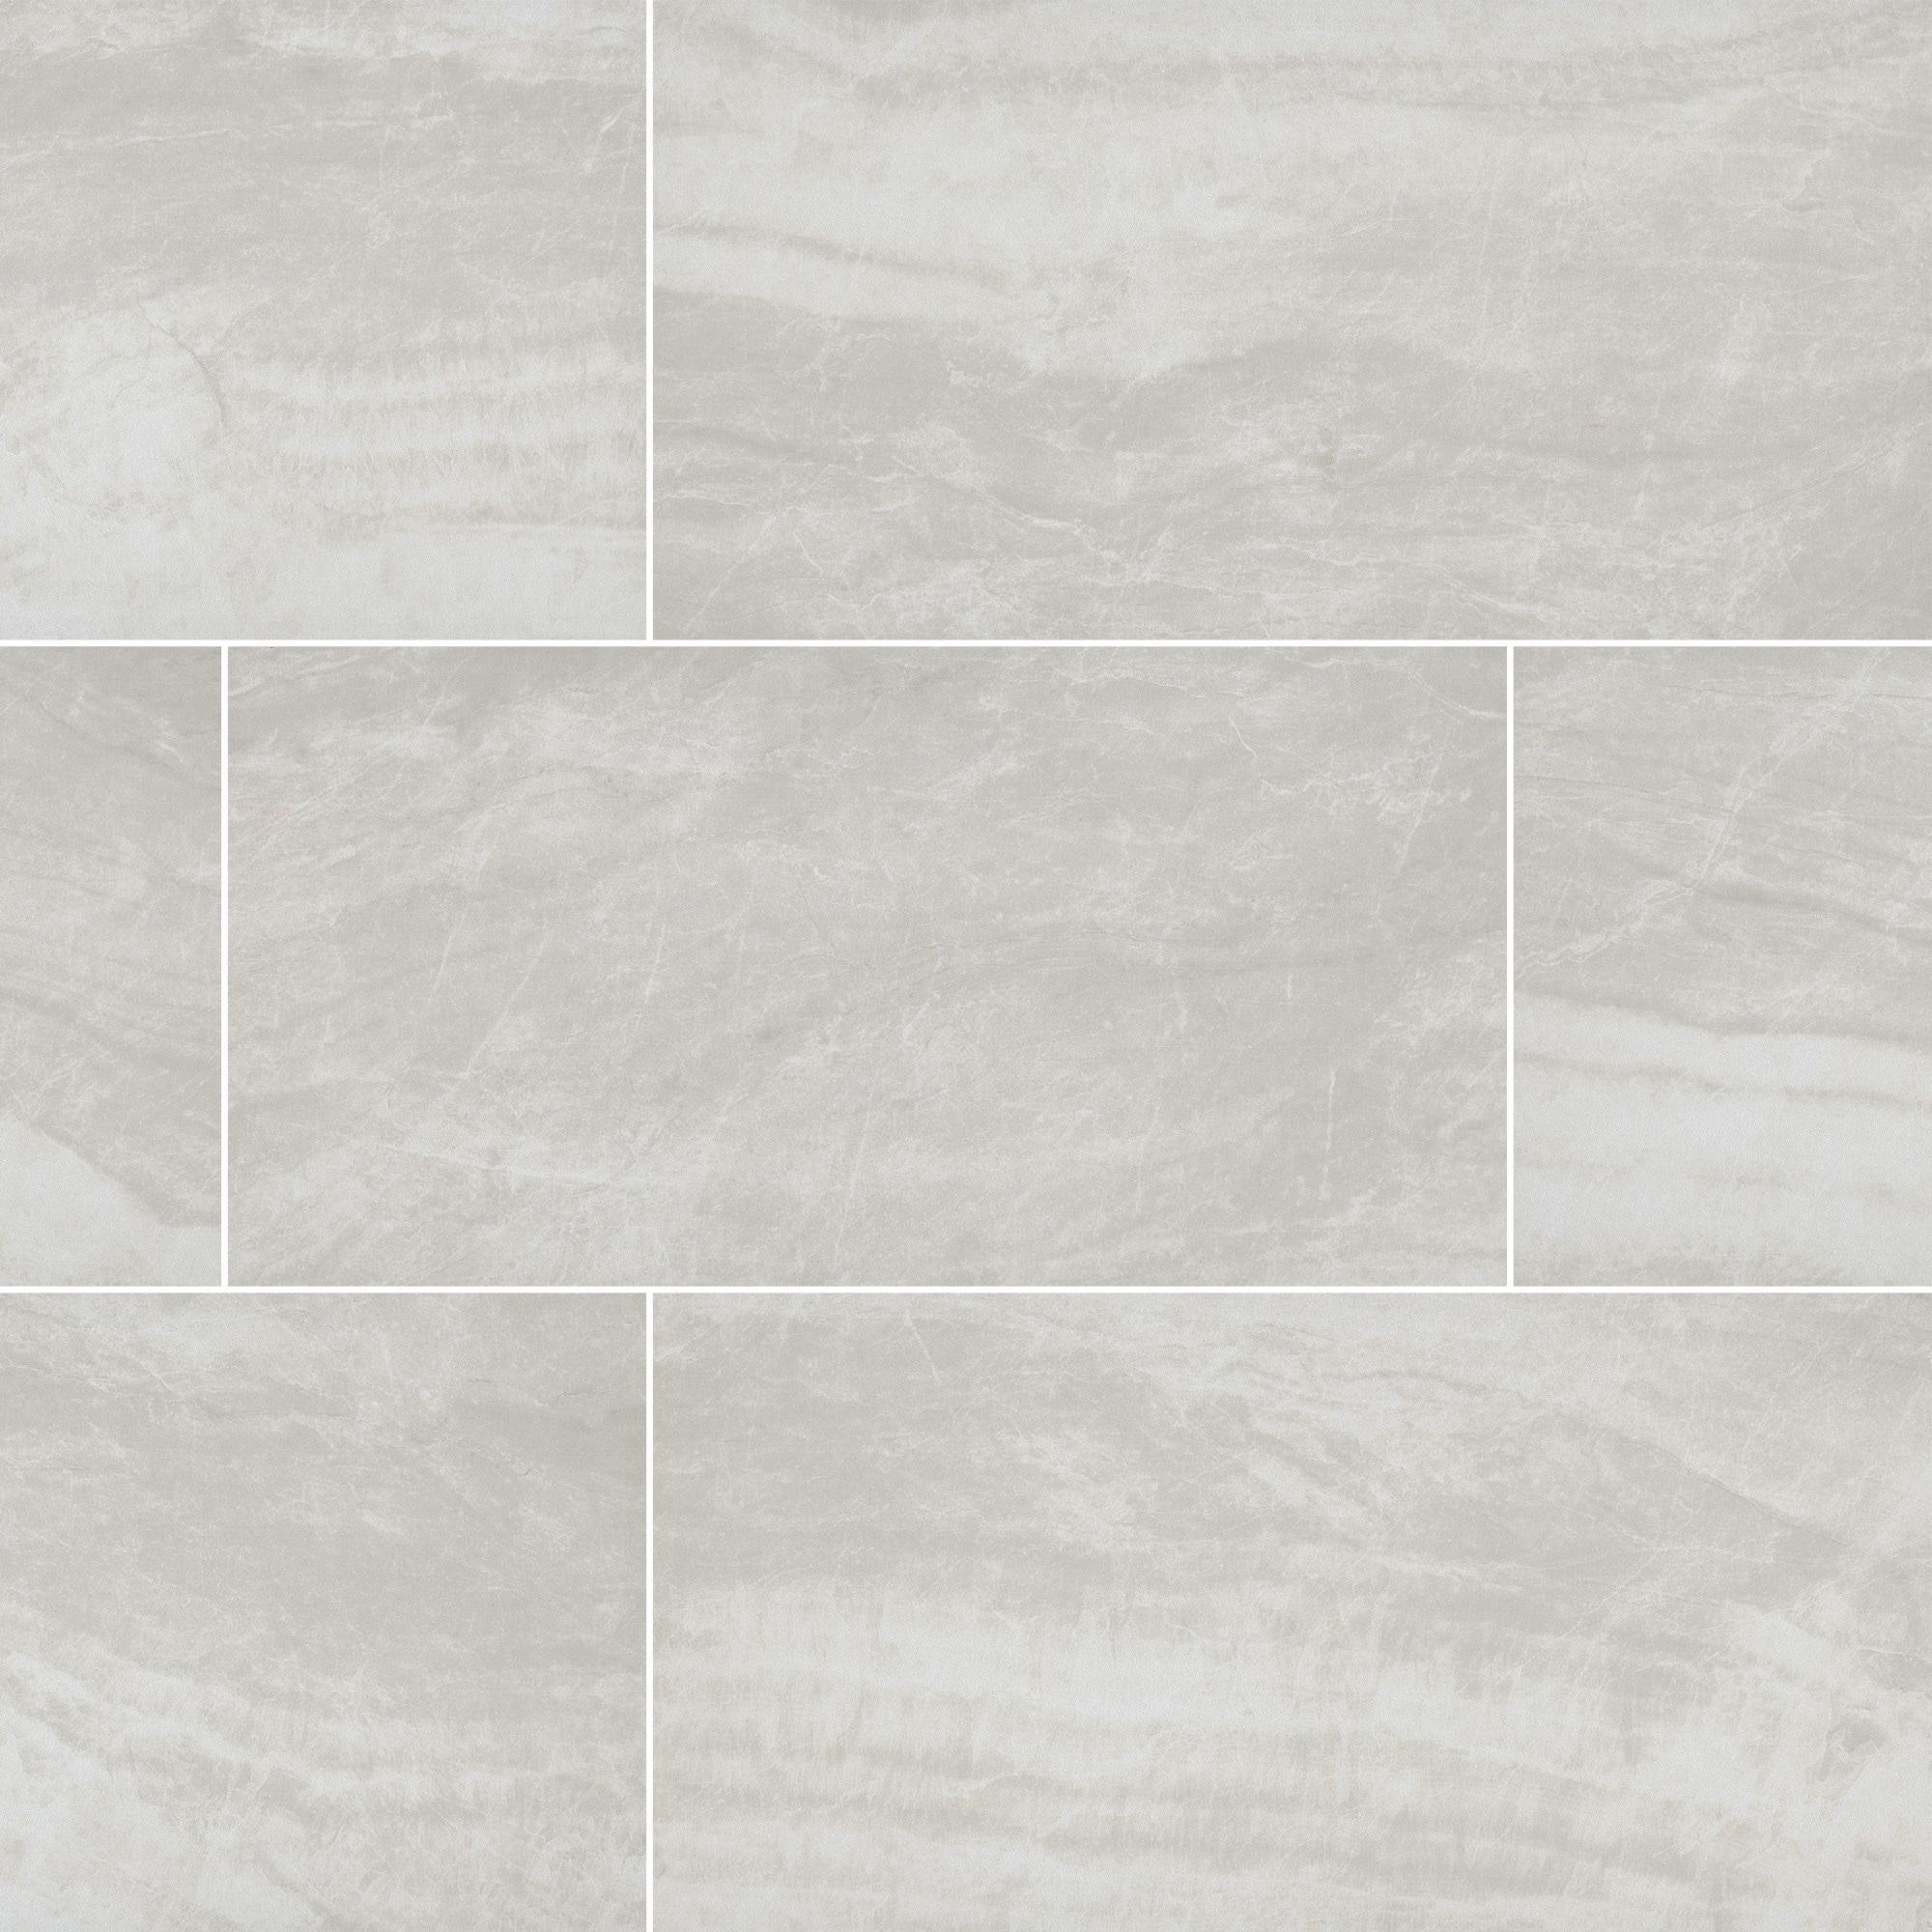 "Blanco MSI NORI1224 Orion 12/"" x 24/"" Rectangle Floor Tile Matte"